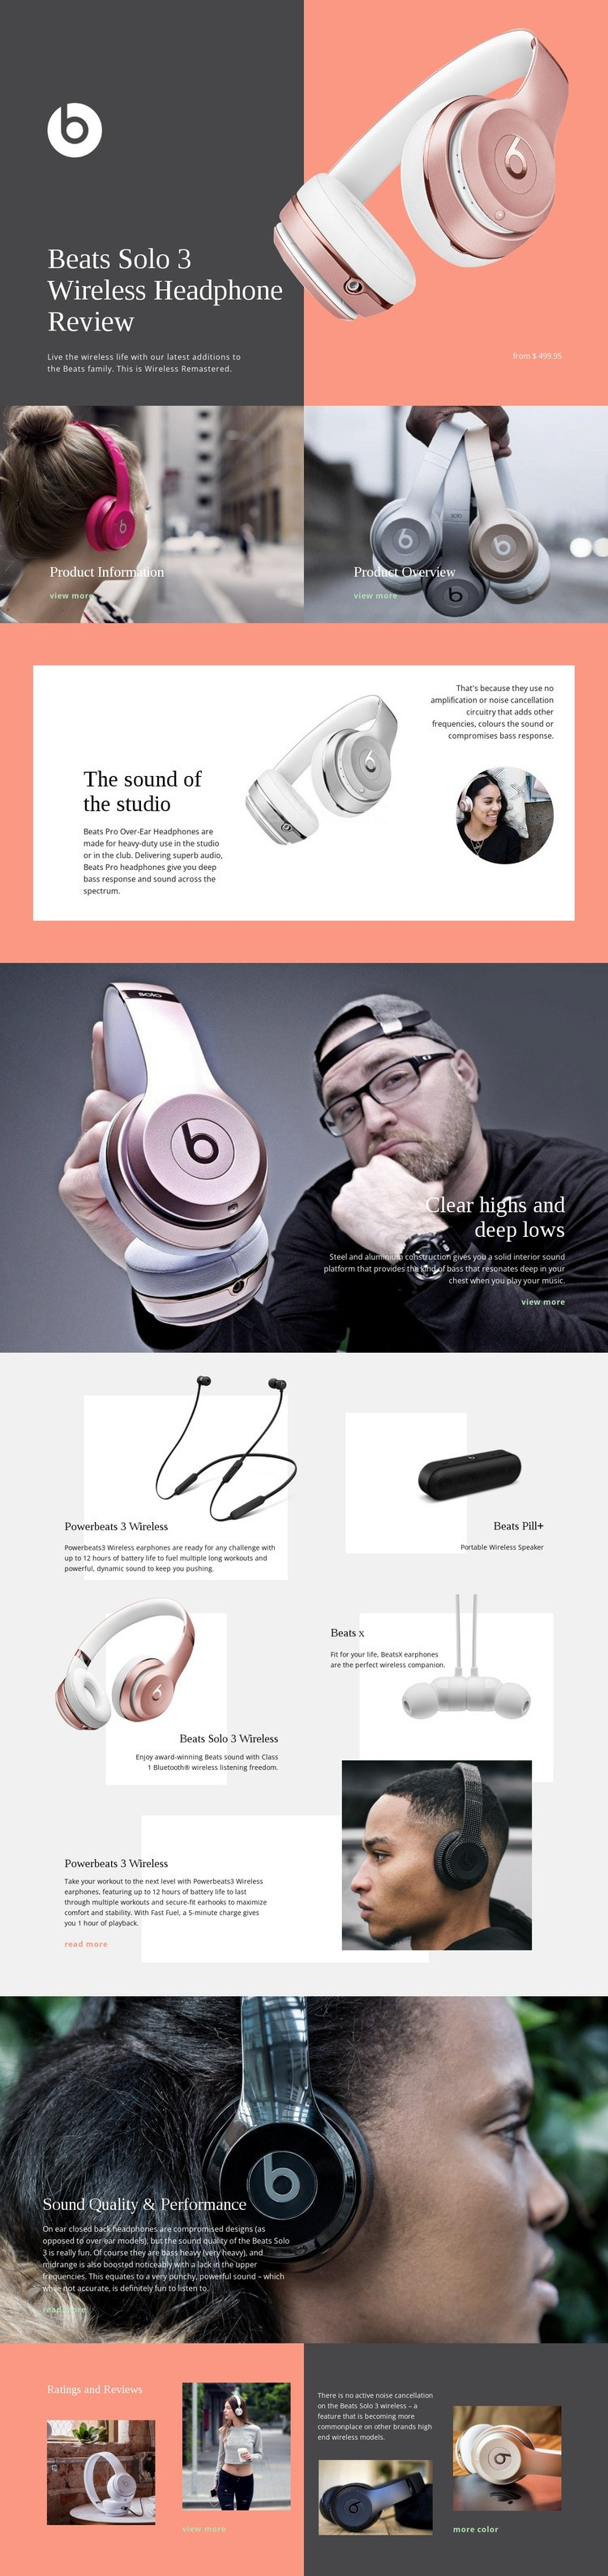 Beats Wireless Html Code Example